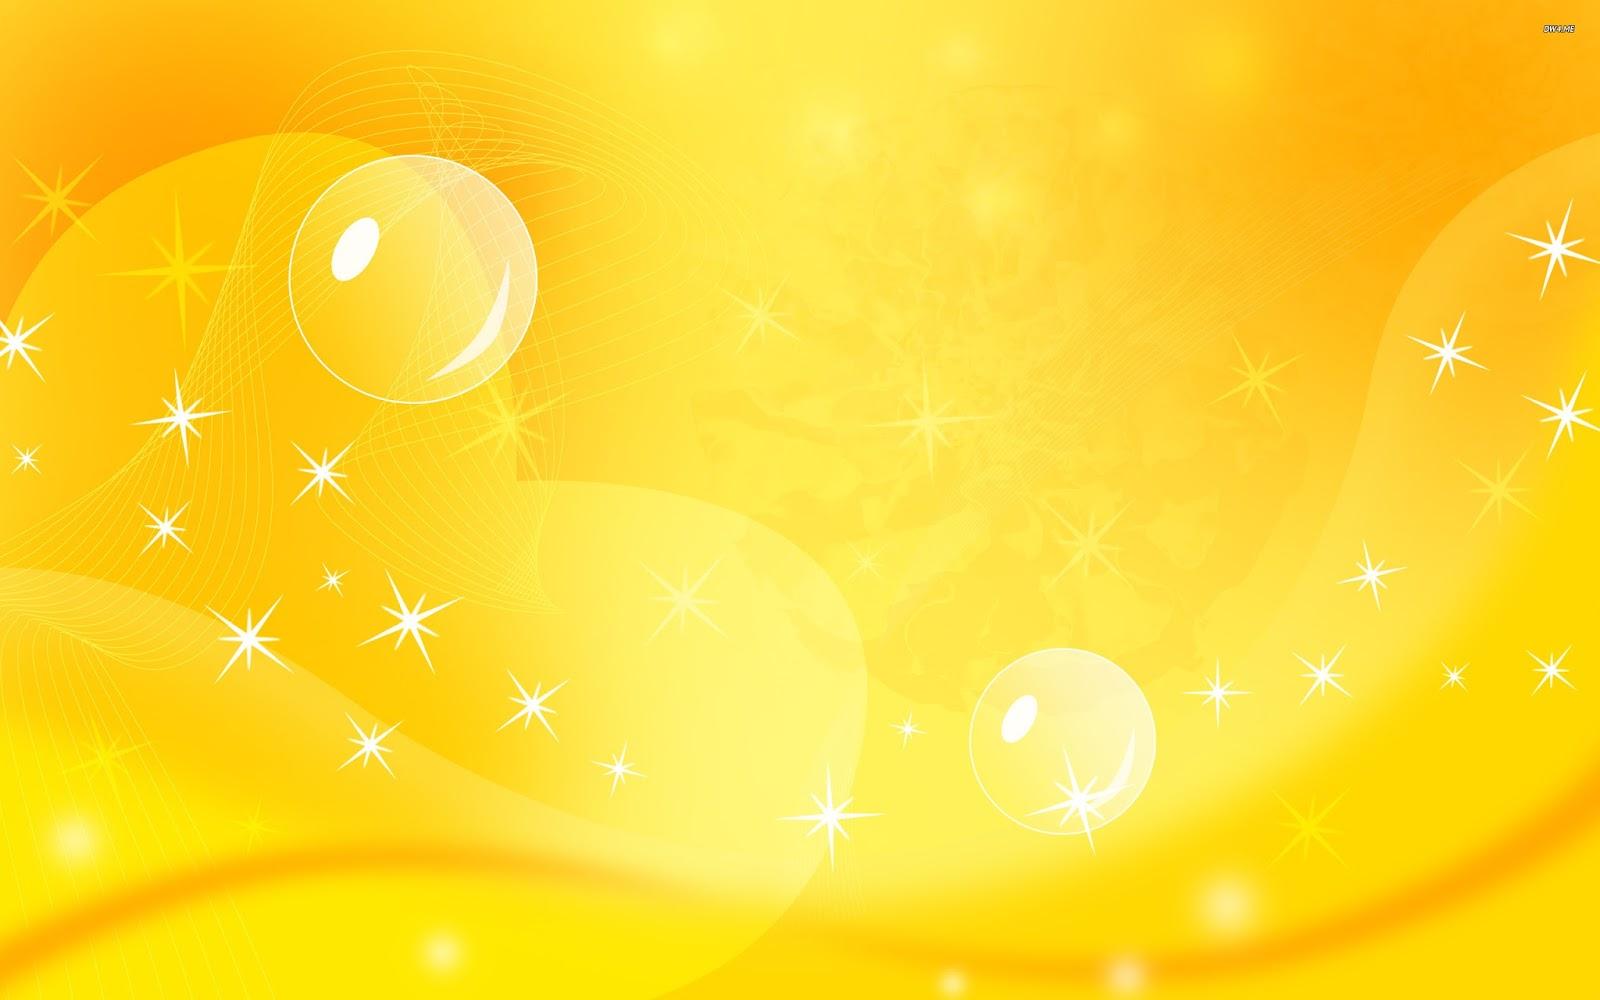 Wallpaper iphone kuning - Jpg 1600x1000 Kuning Backgrounds